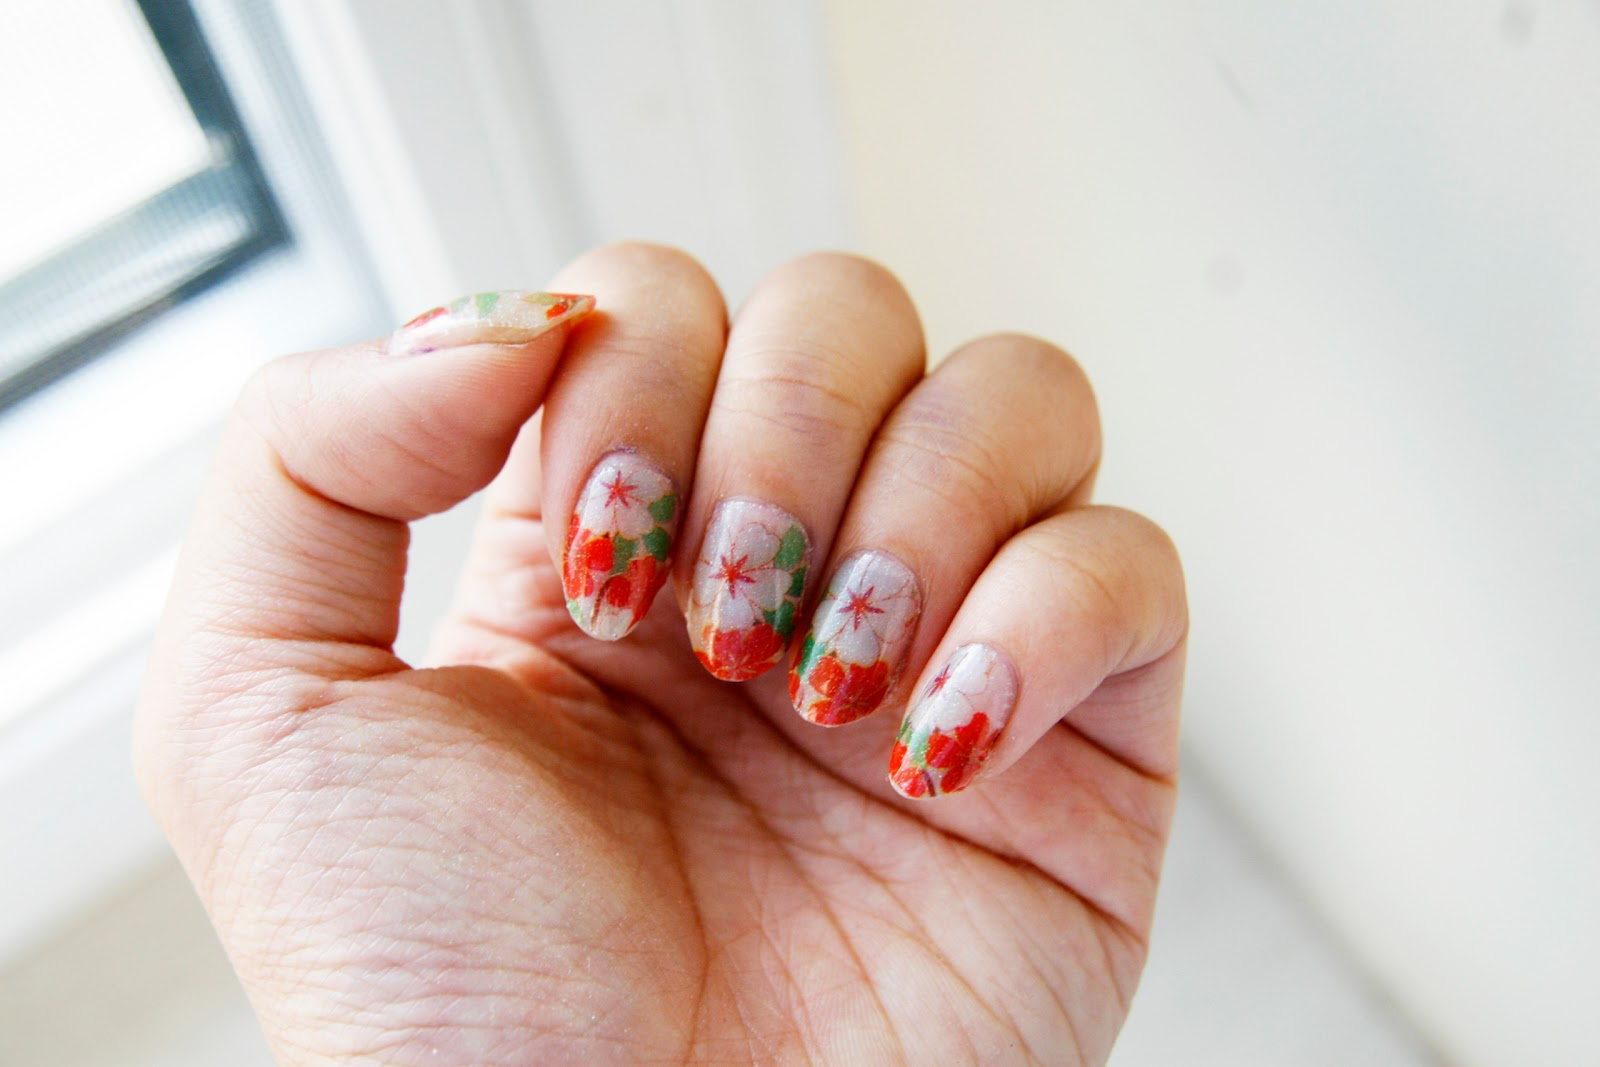 fun size beauty: Born Pretty Store Romantic Flower Patterned Nail ...